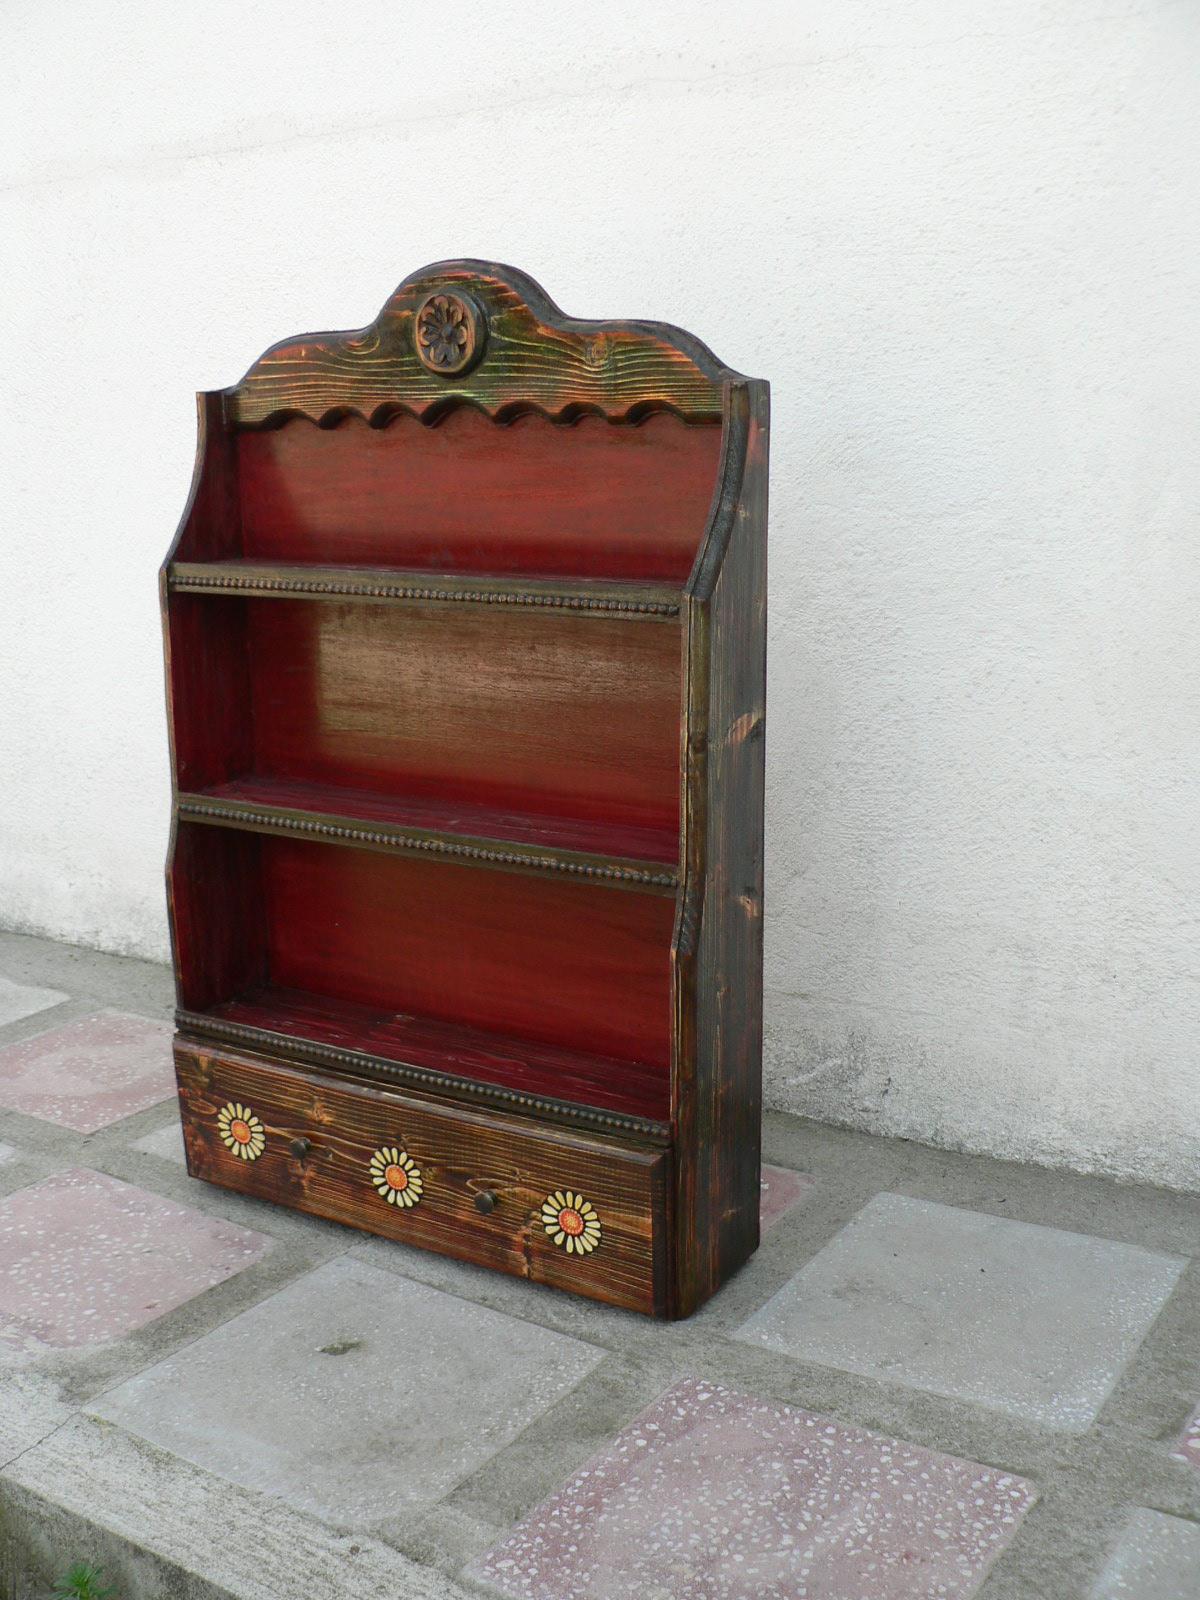 BLIDAR CU SERTAR-lemn de brad si tei sculptat.Dim.120x80x25cm.